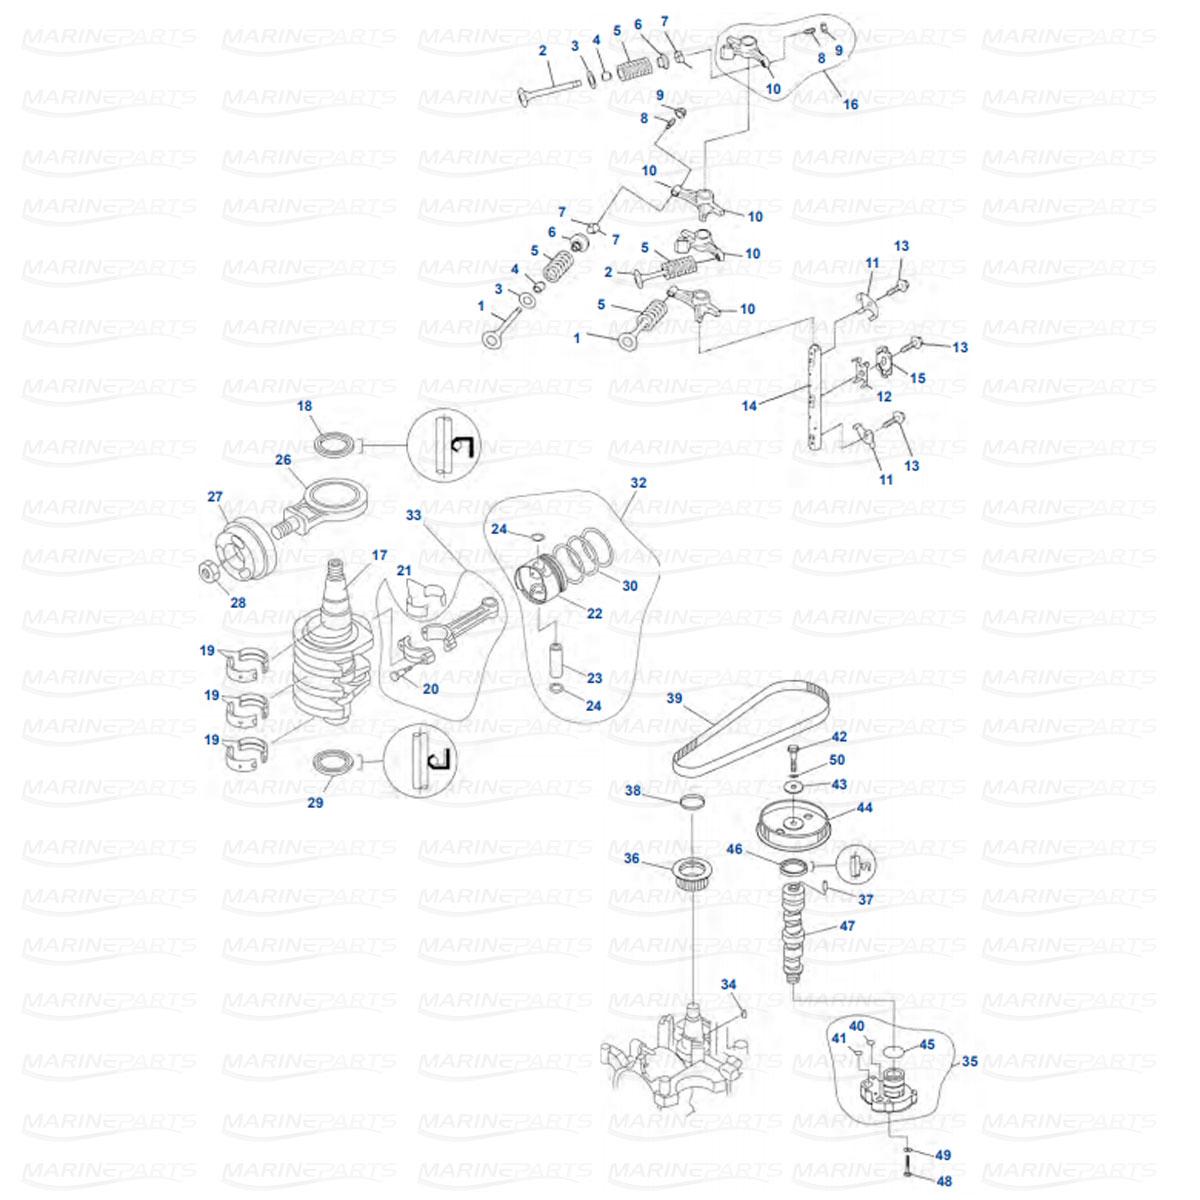 Piston, Crankshaft, Valves Yamaha FT, F20, F25 (1998-08)